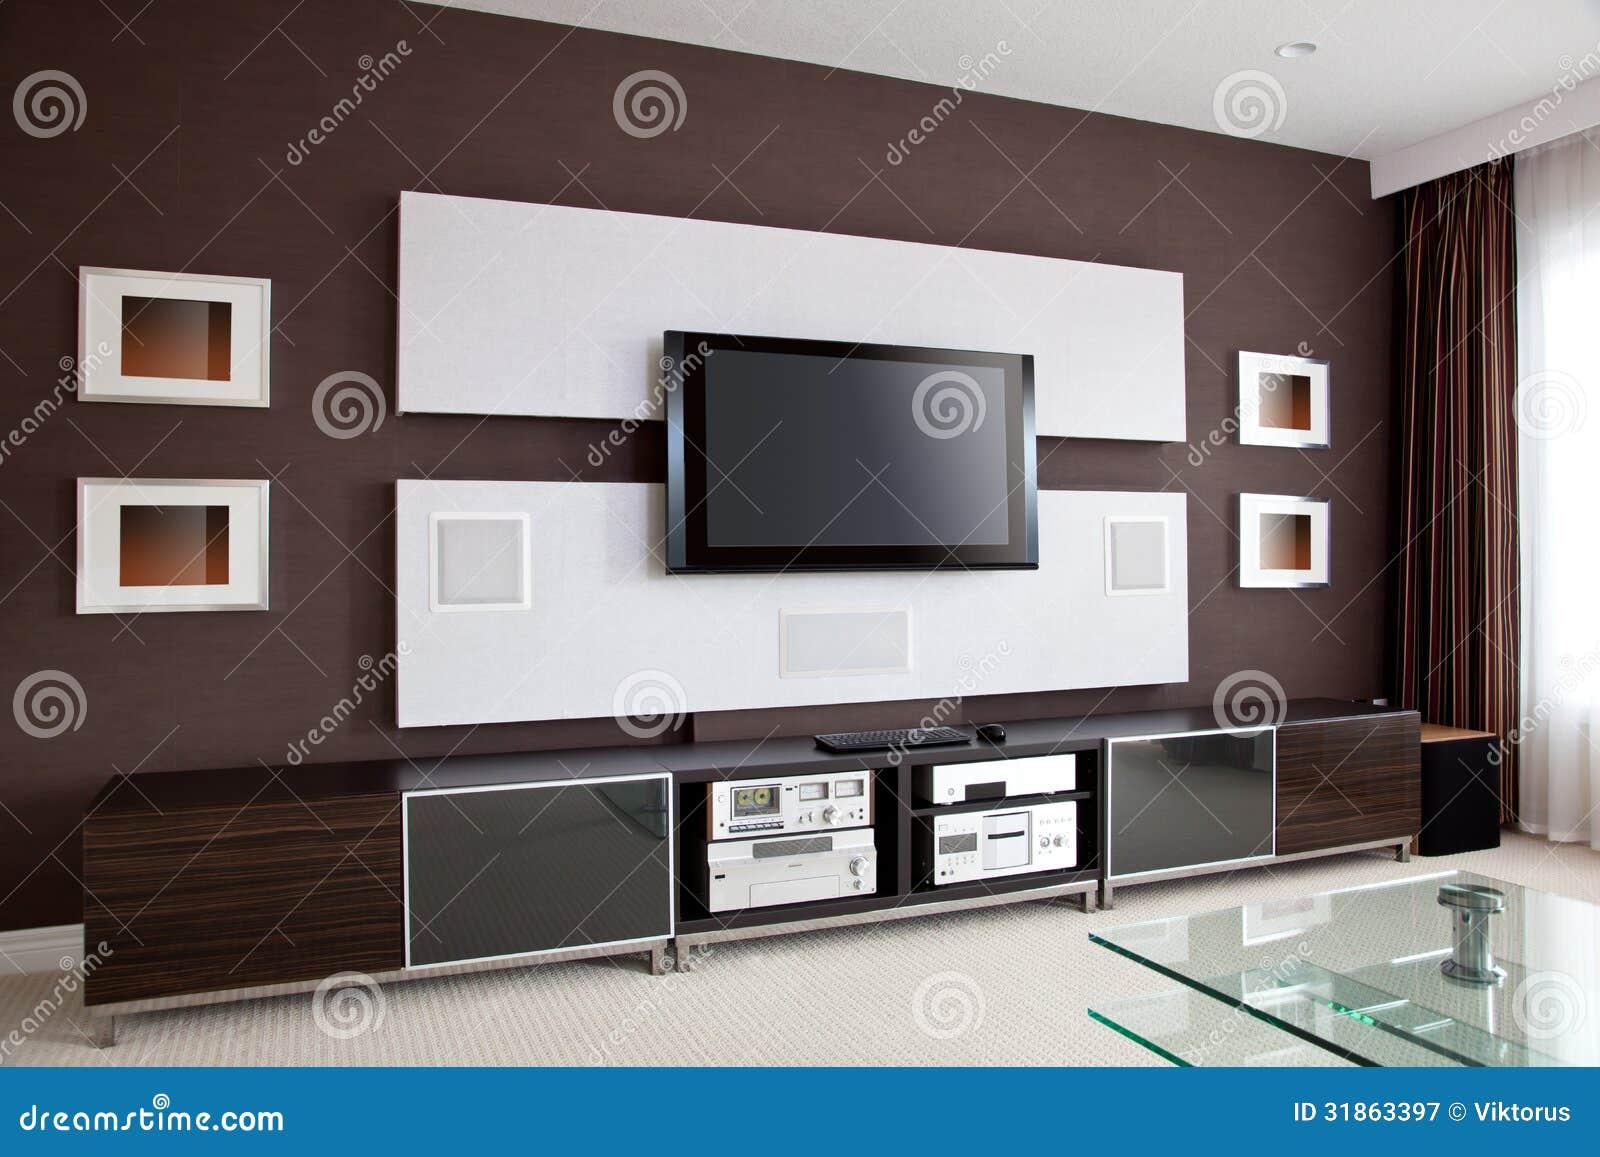 Int233rieur Moderne De Pi232ce De Home Cin233ma Avec L233cran  : intrieur moderne de pice de home cinma avec l cran plat tv 31863397 from fr.dreamstime.com size 1300 x 957 jpeg 129kB